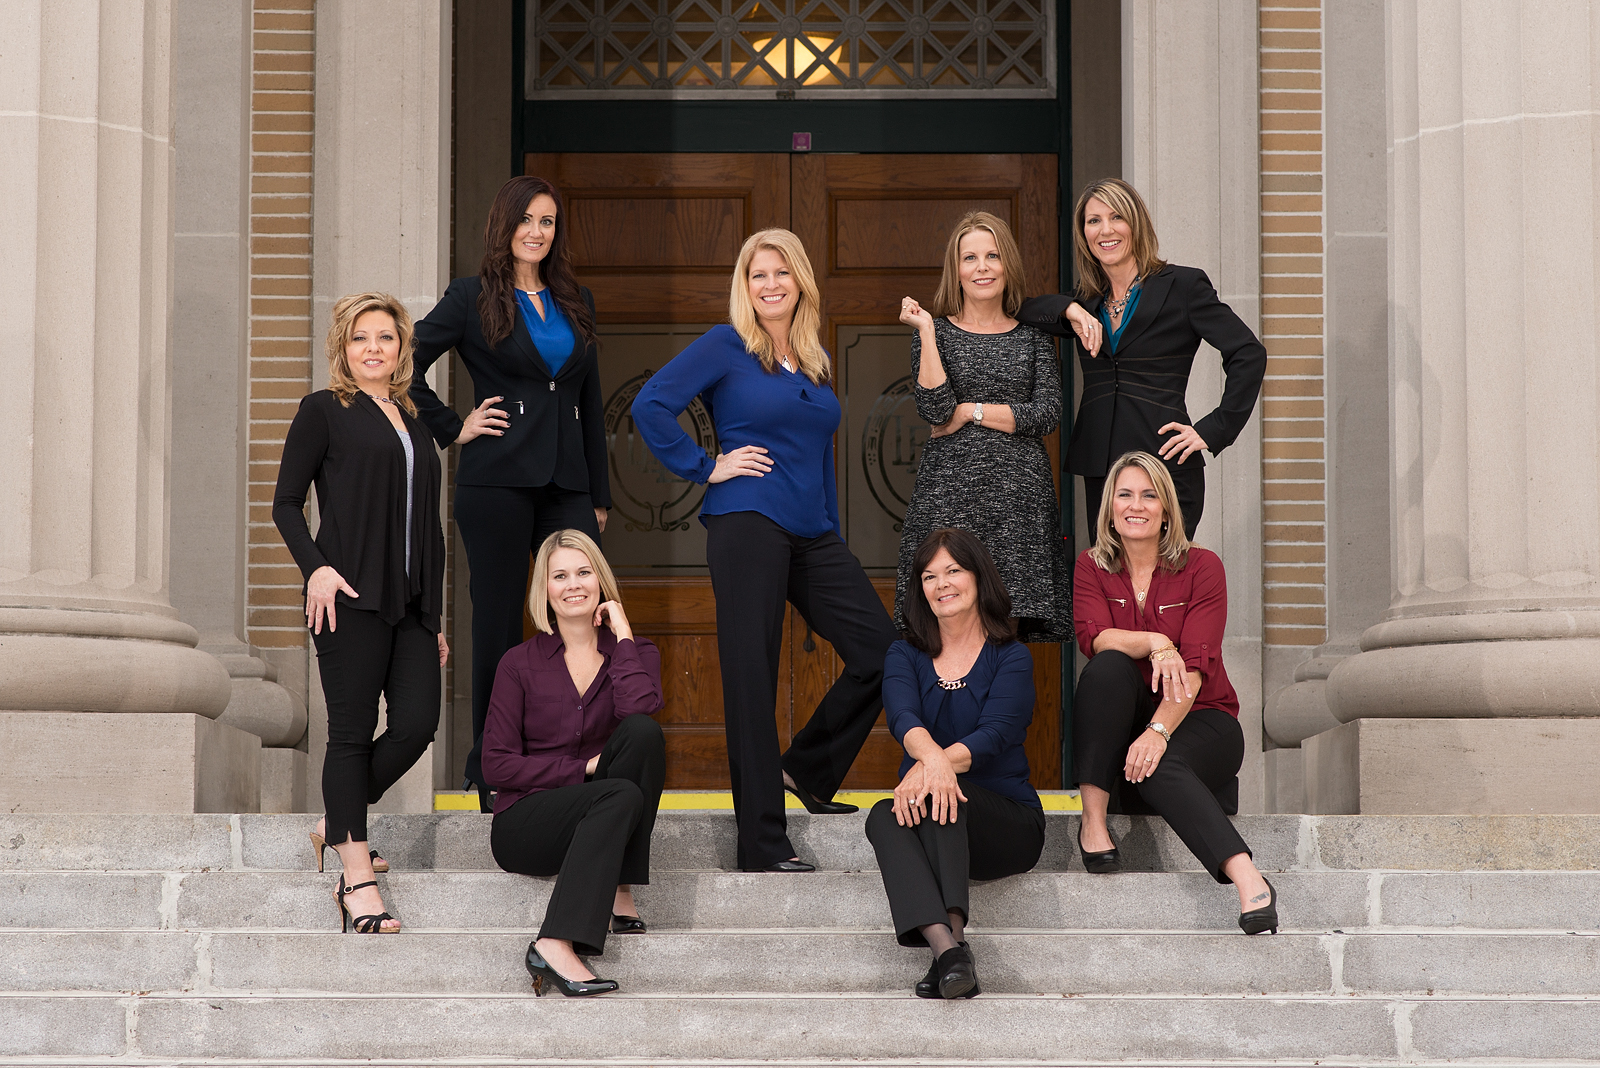 04-legal-team-courthouse-steps-women-group-fashion-team-headshots-megan-dipiero-photography-fort-myers.jpg